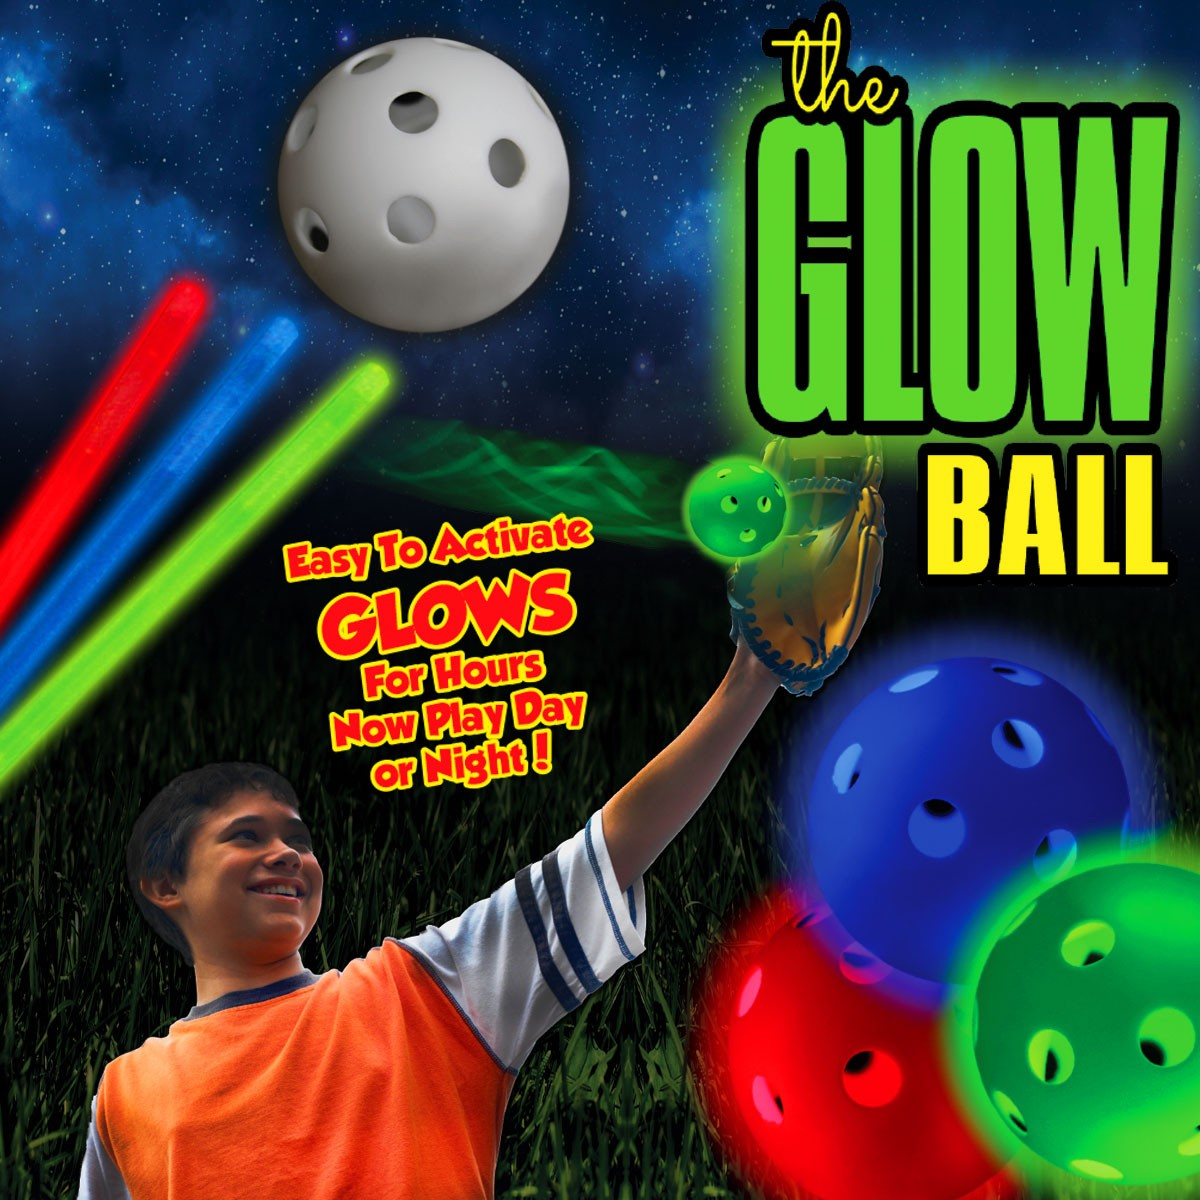 The Glow Ball